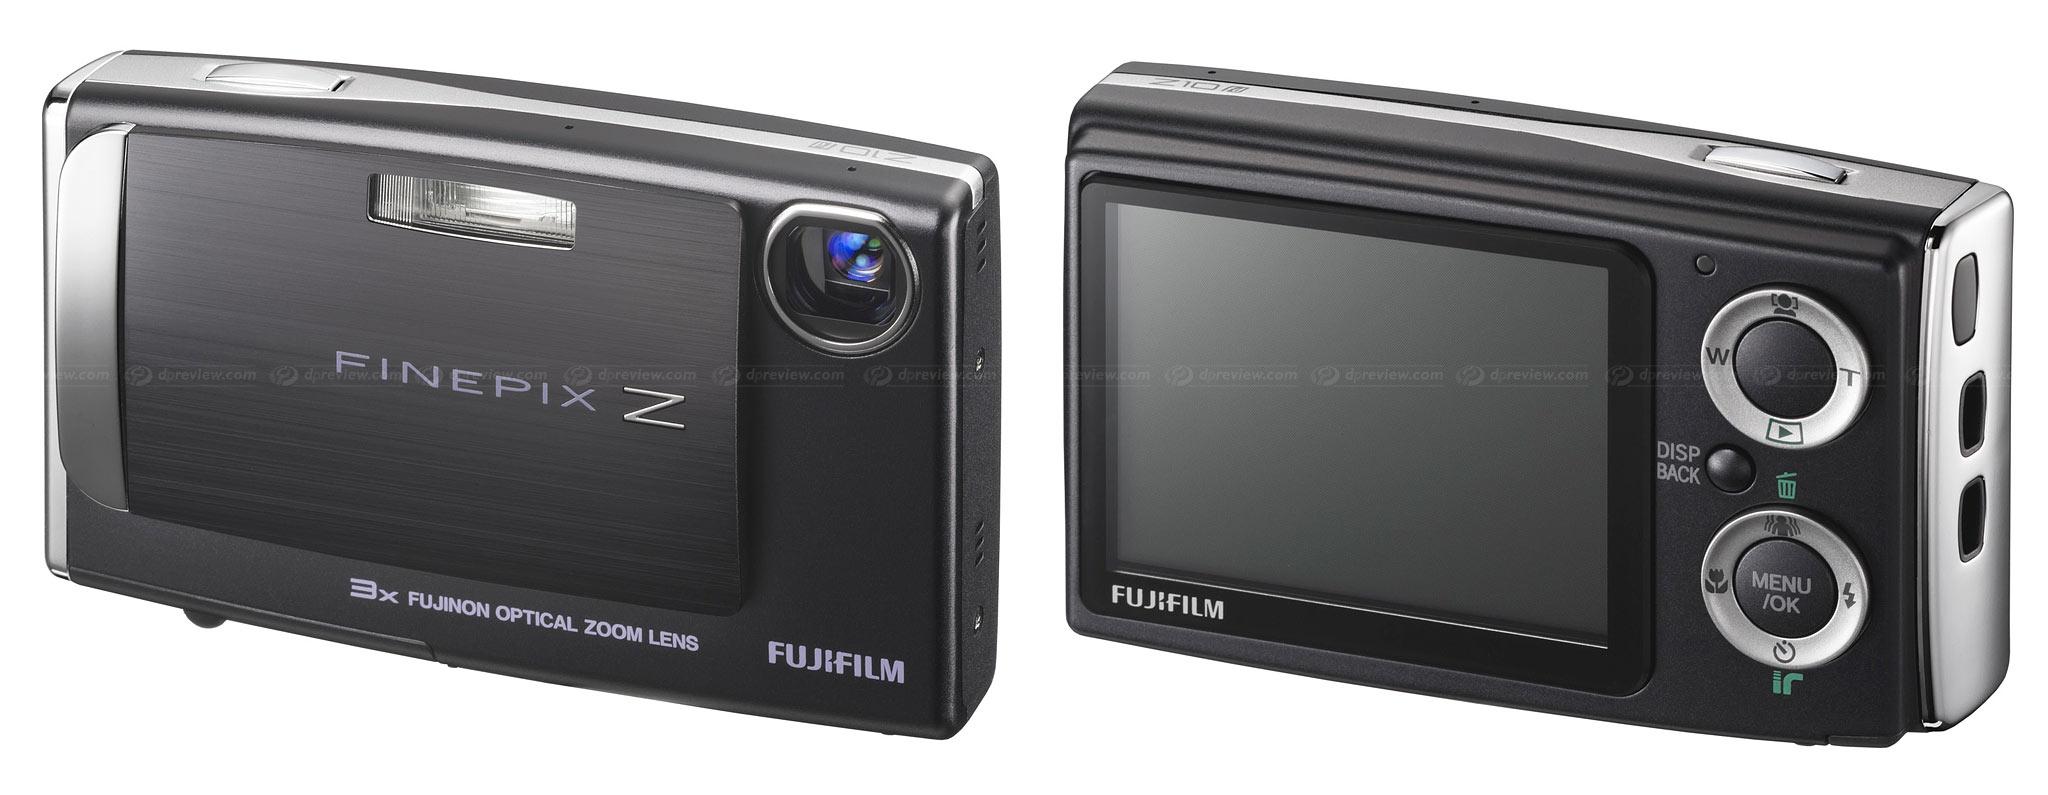 fujifilm finepix z10fd face it beam it blog it digital rh dpreview com